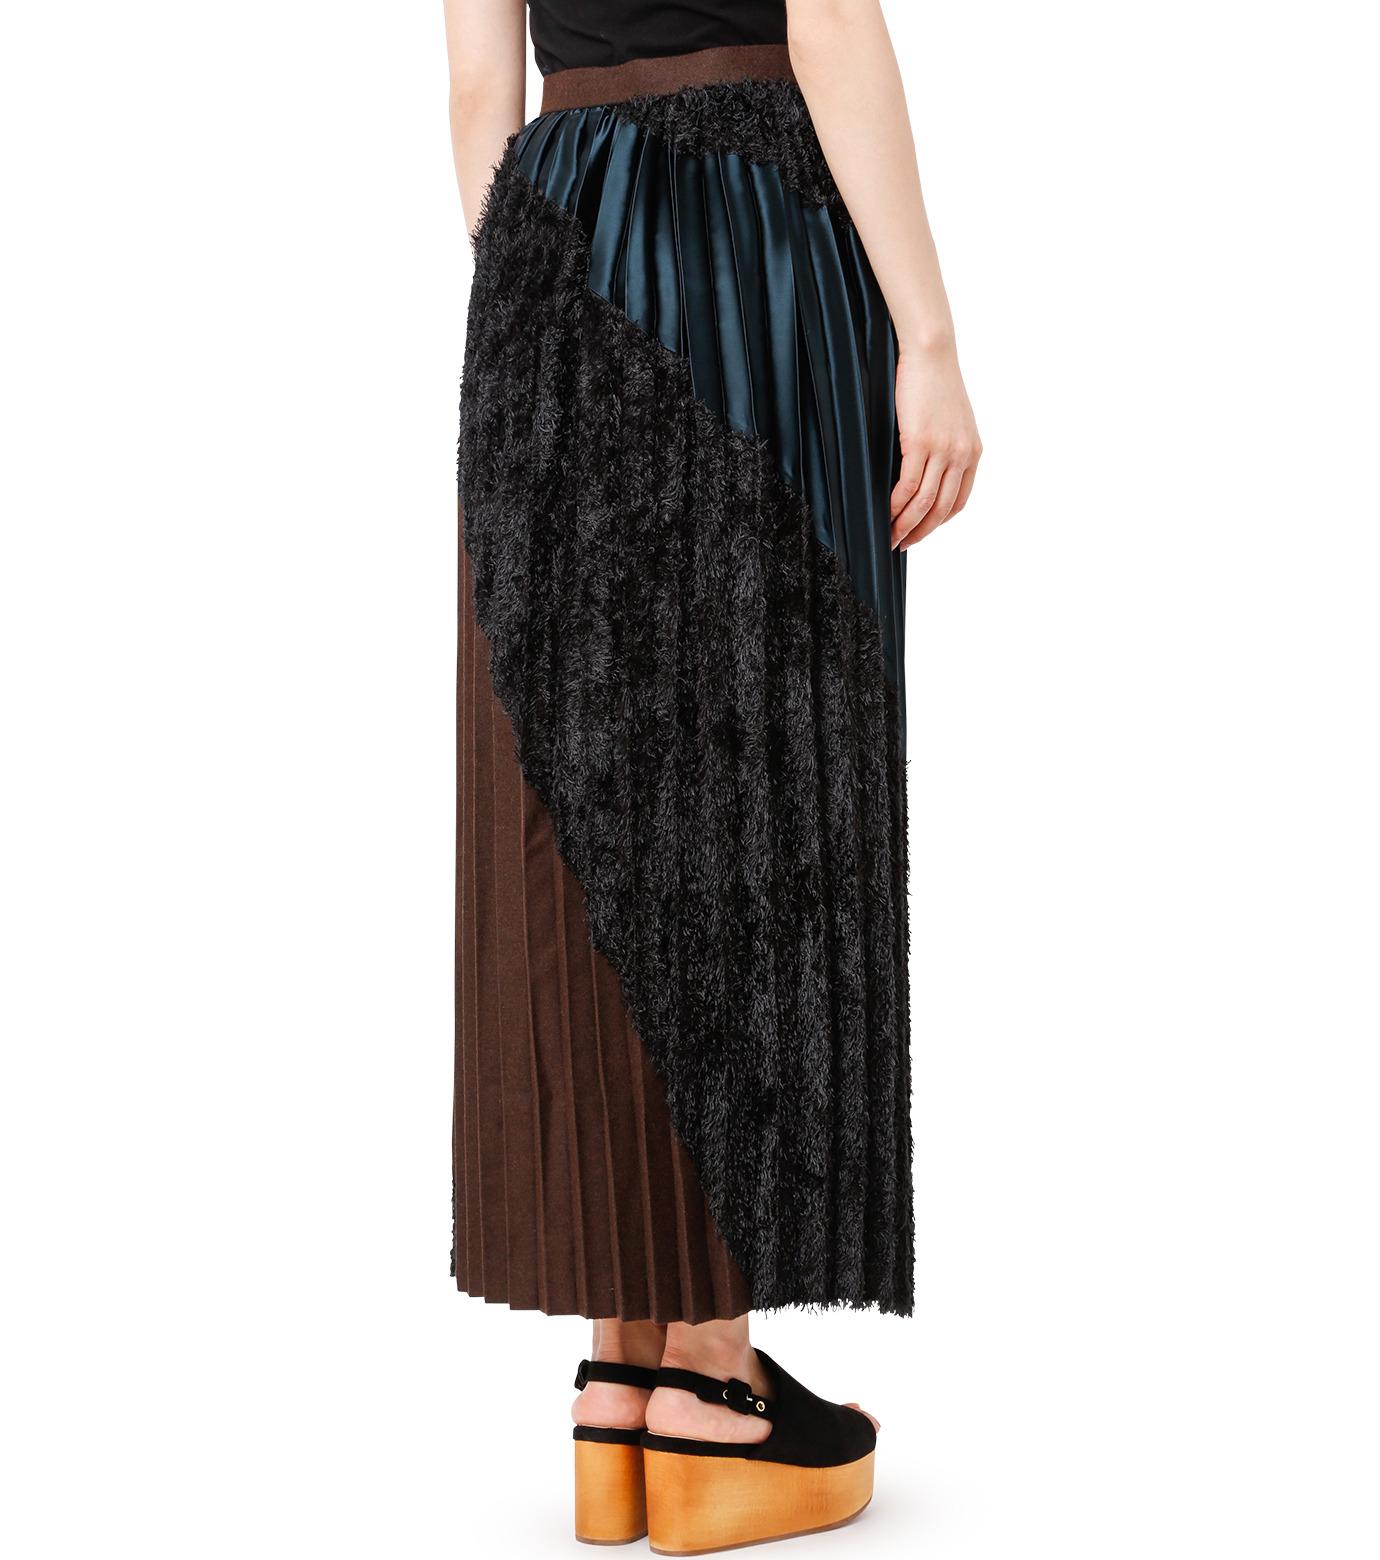 KOLOR(カラー)のLong Pleated Skirt Mixed Jacquard-BLACK(スカート/skirt)-16WCL-S03129-13 拡大詳細画像2